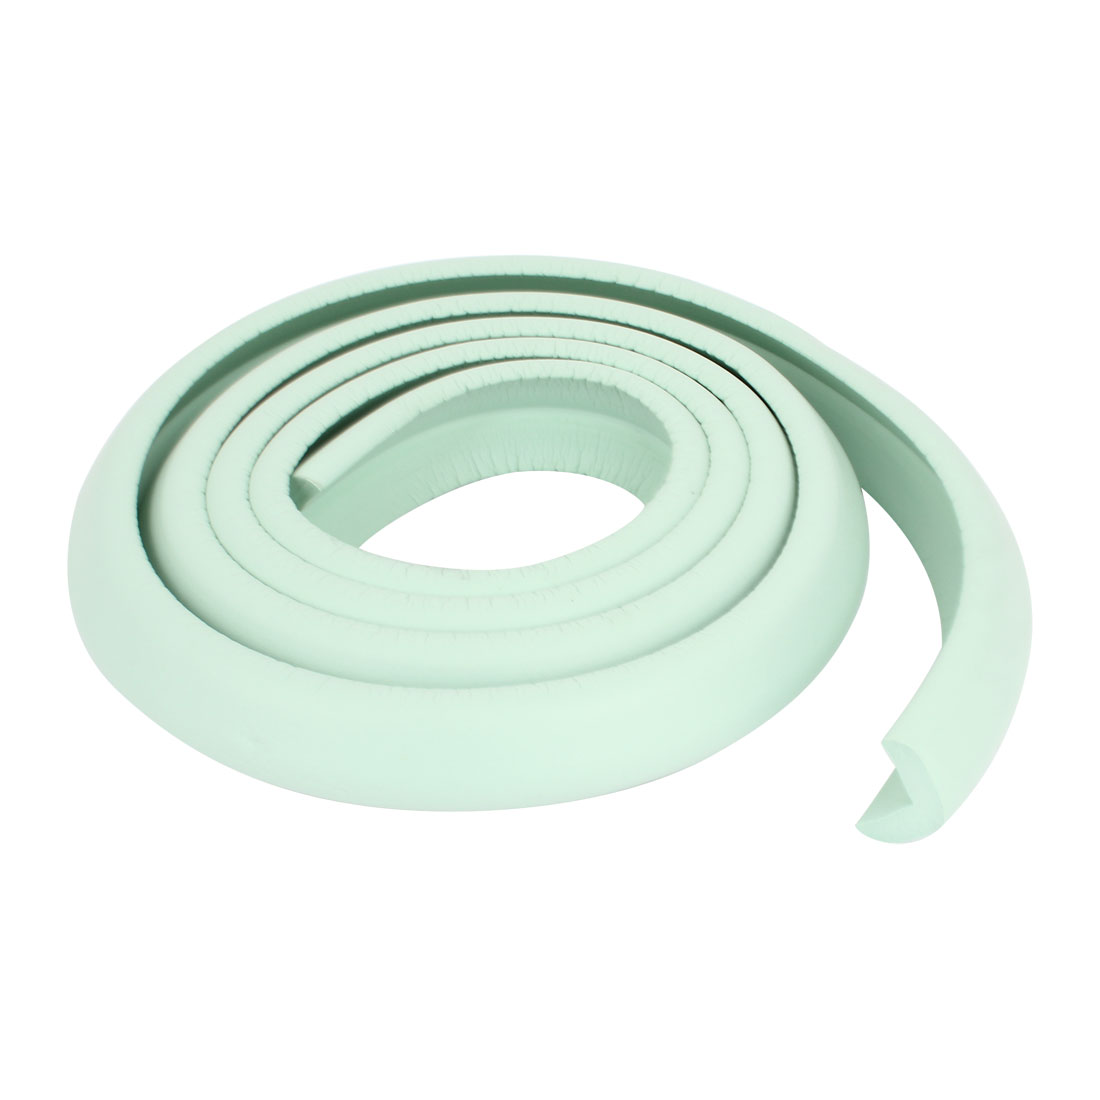 Soft Flexible Foam Table Corner Edge Protector Guard Strip 2M Long 3cm Width Light Green